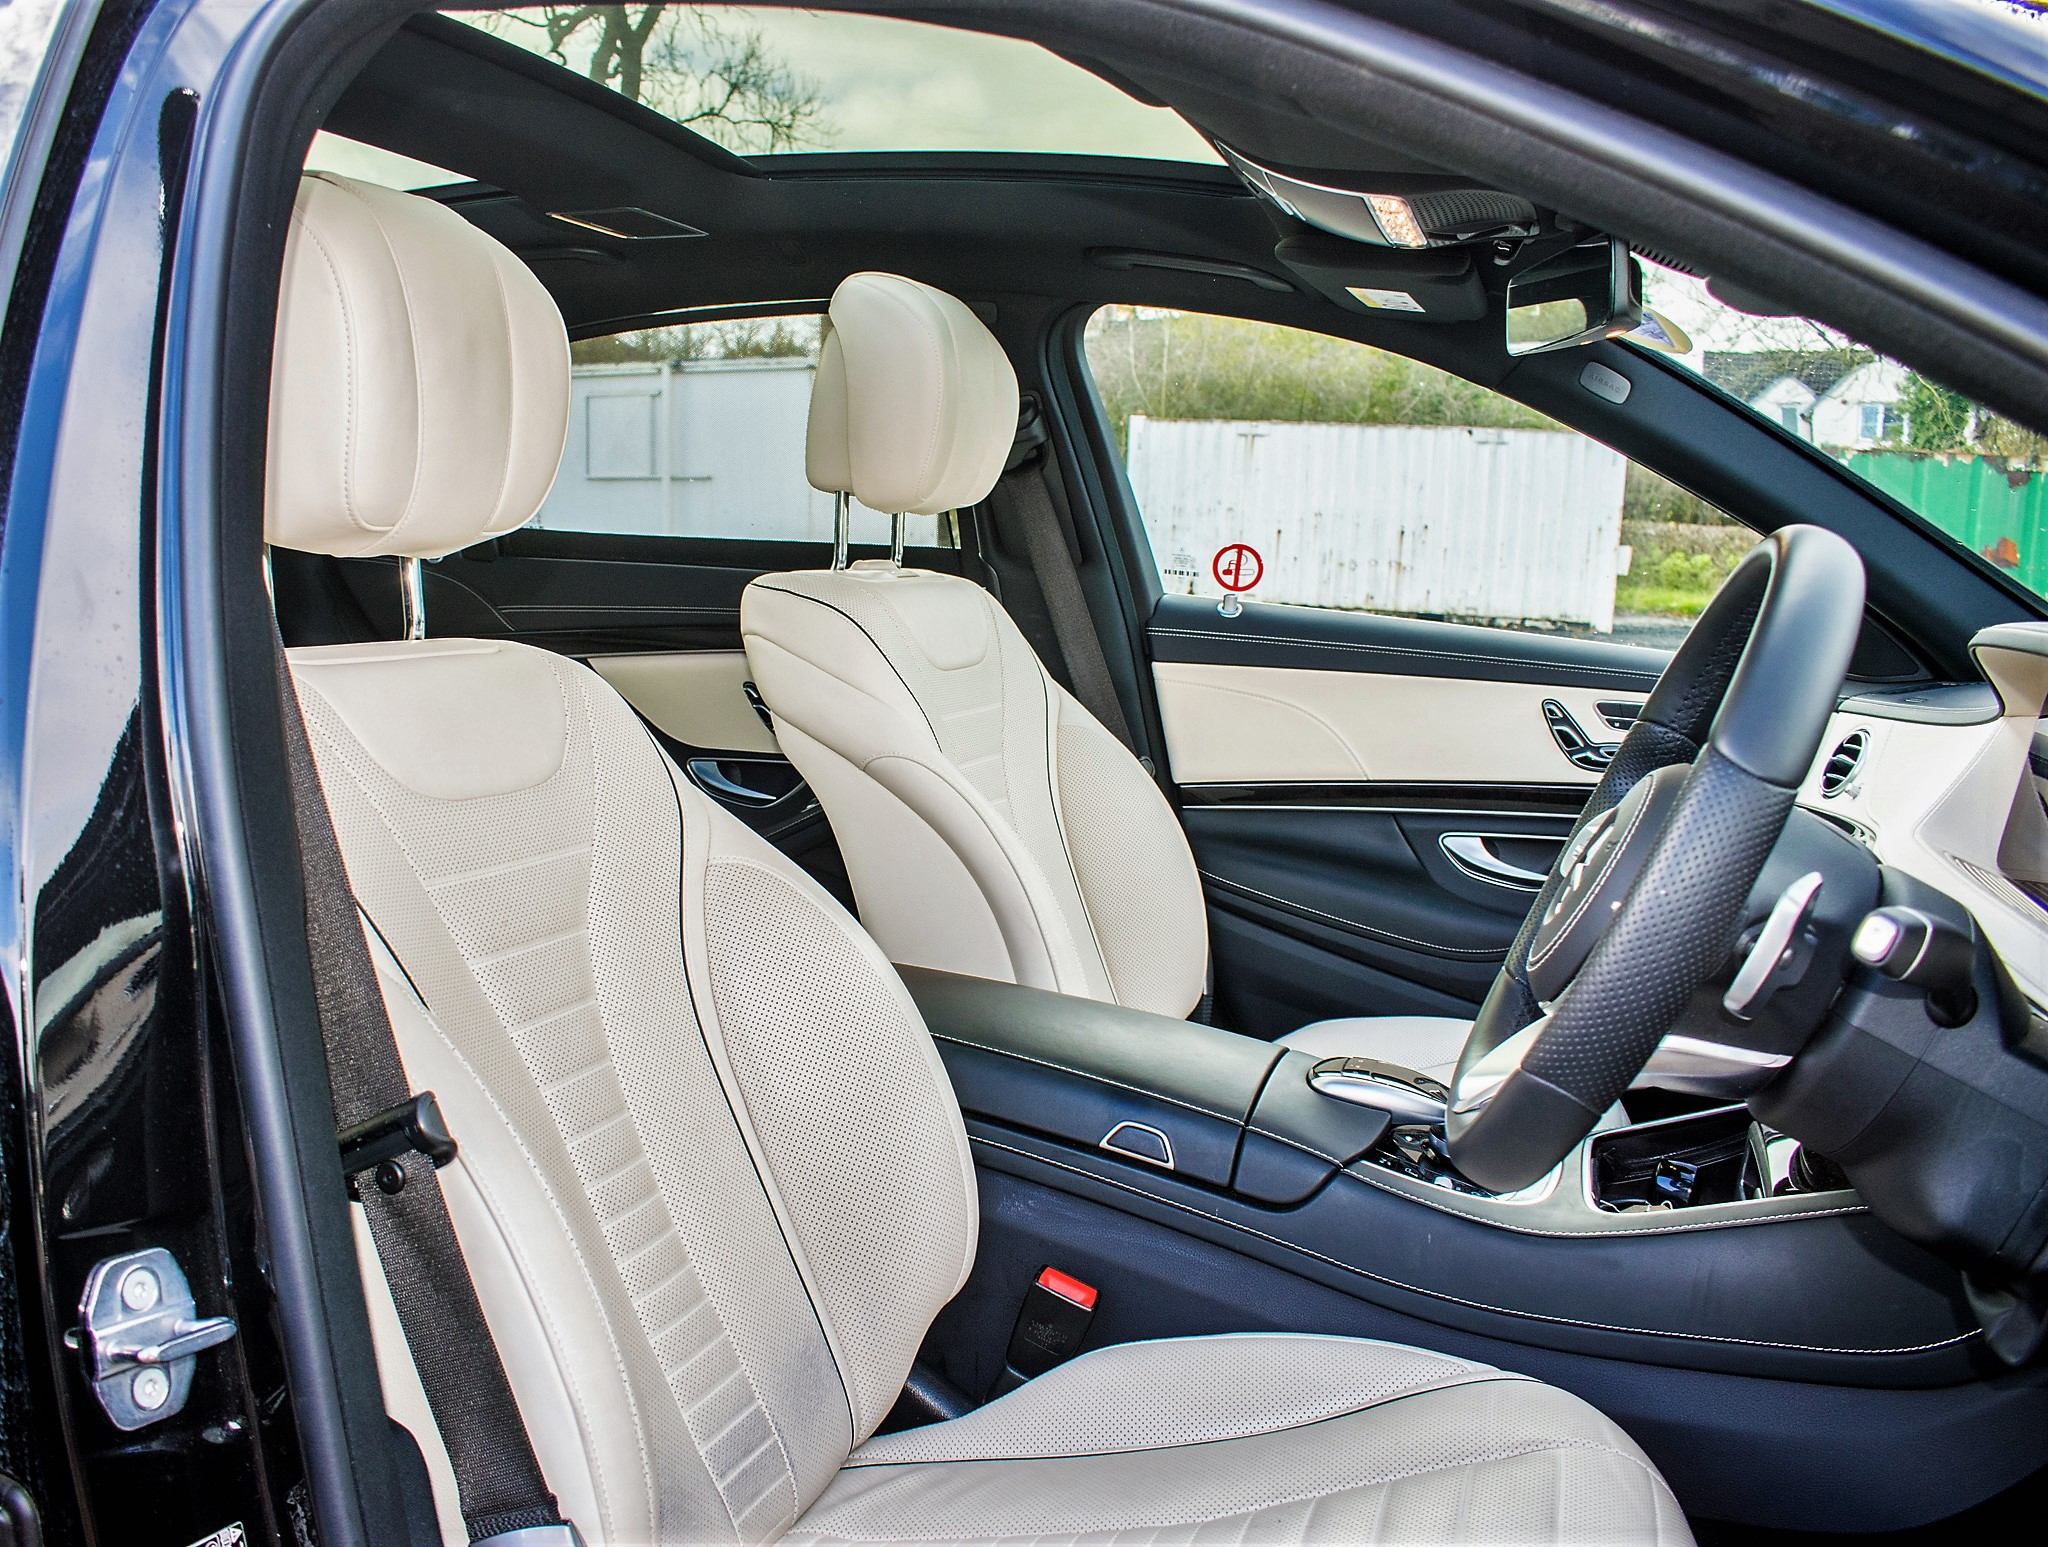 Mercedes Benz S450 L AMG Line Executive auto petrol 4 door saloon car Registration Number: FX68 - Image 21 of 30